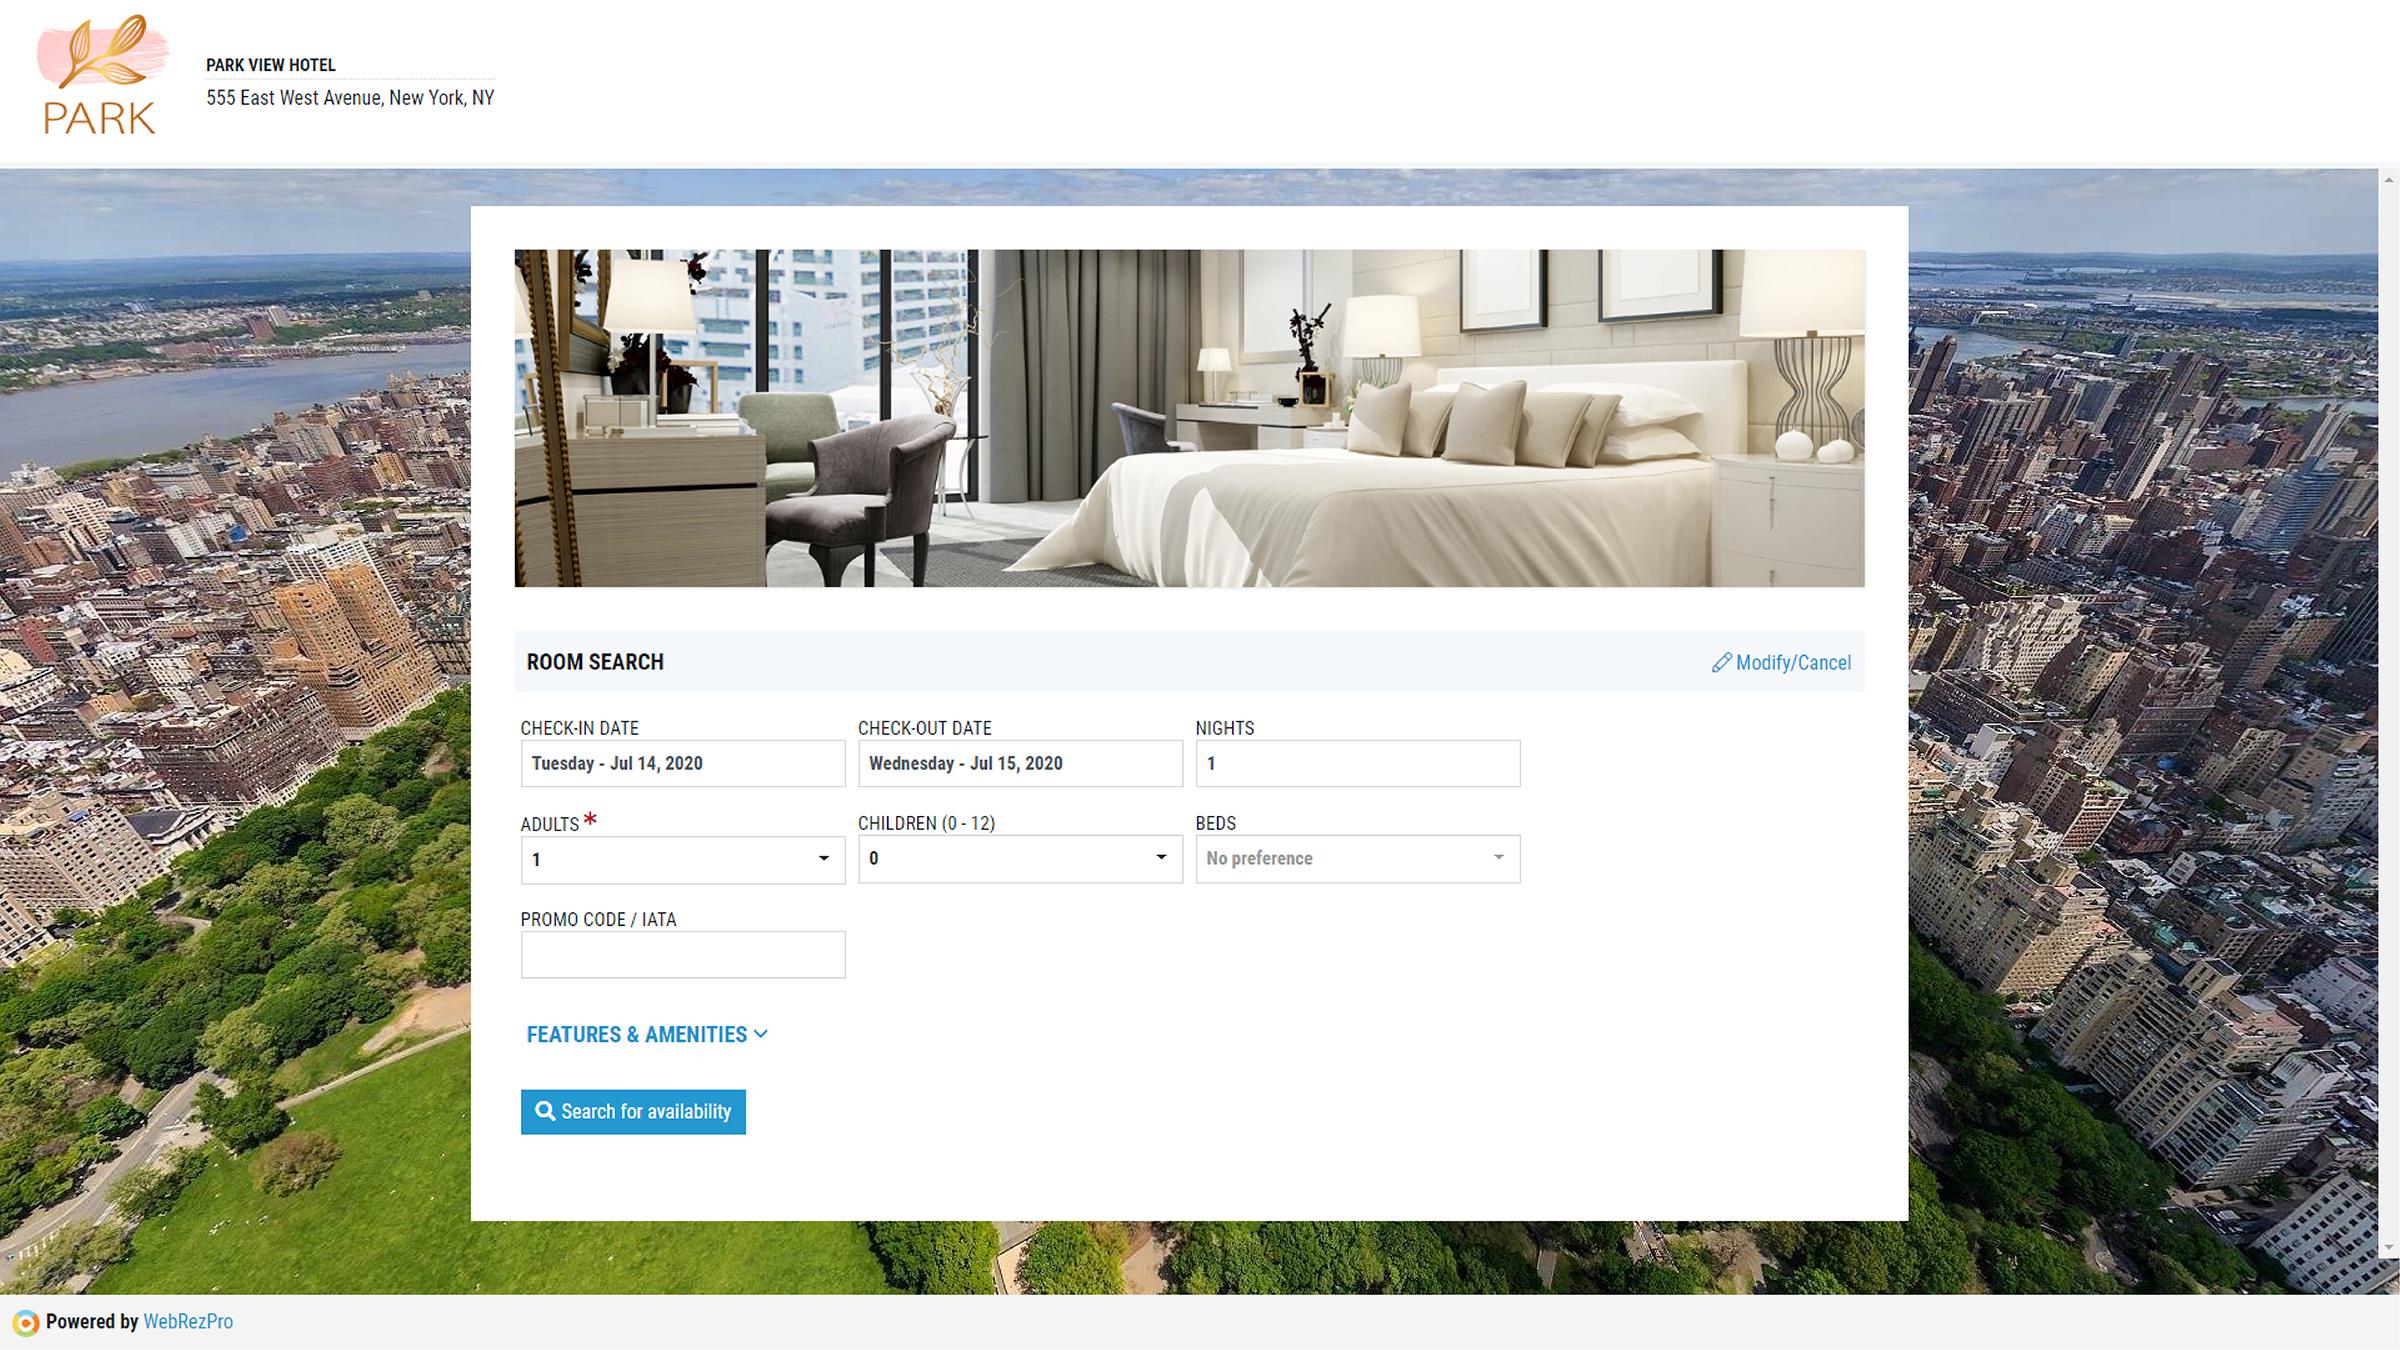 WebRezPro Booking Engine